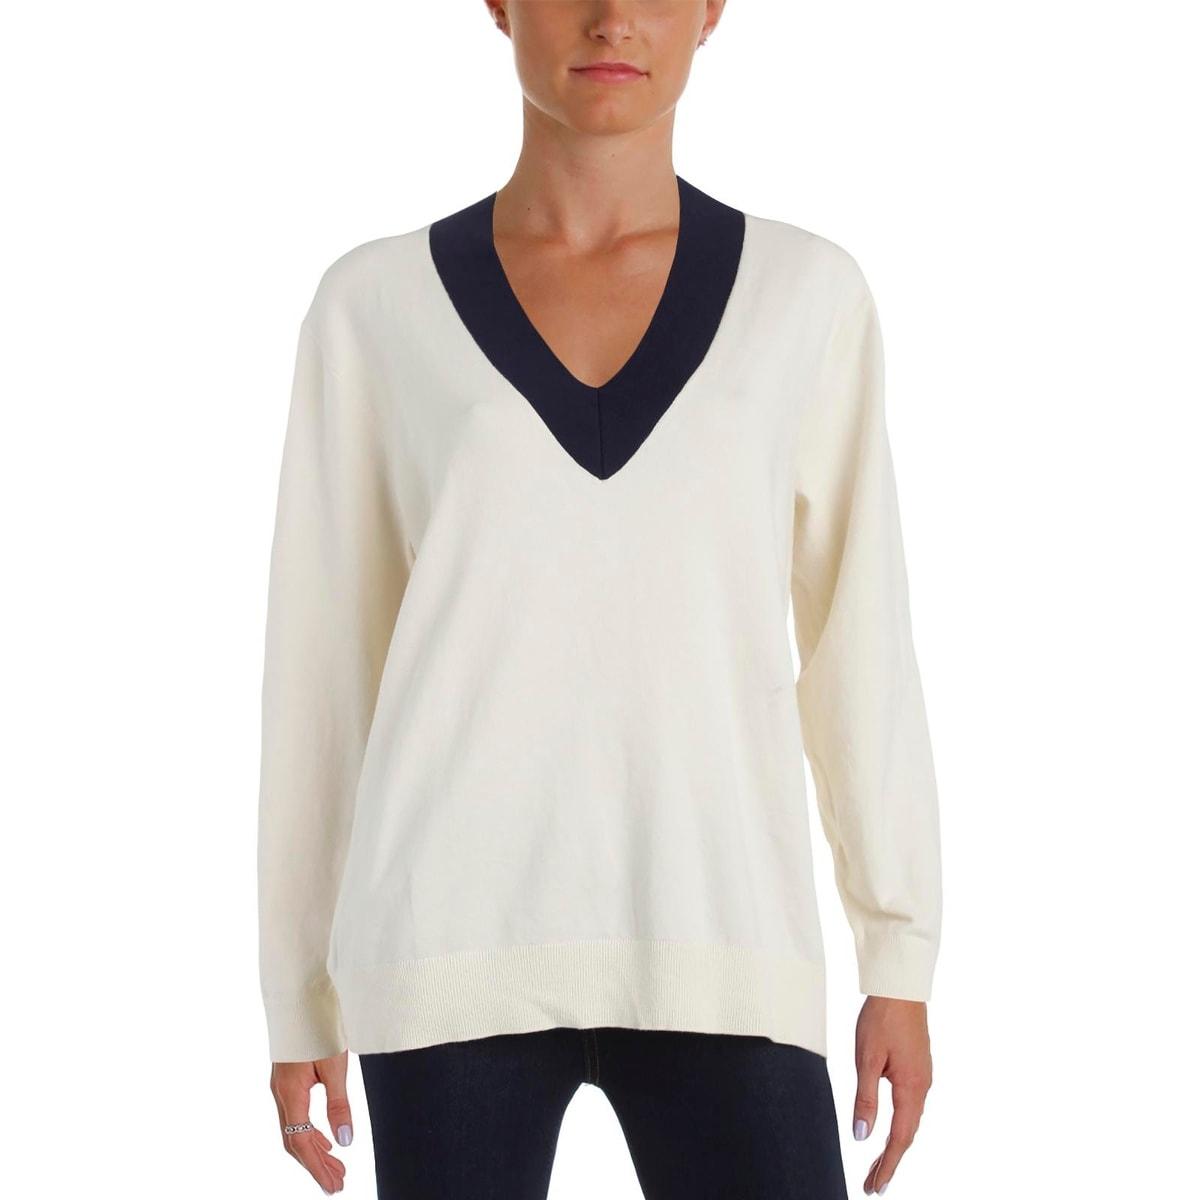 e7de0dd7b54fe Ralph Lauren Womens Pullover Sweater Contrast Trim Ruched V-Neck - m